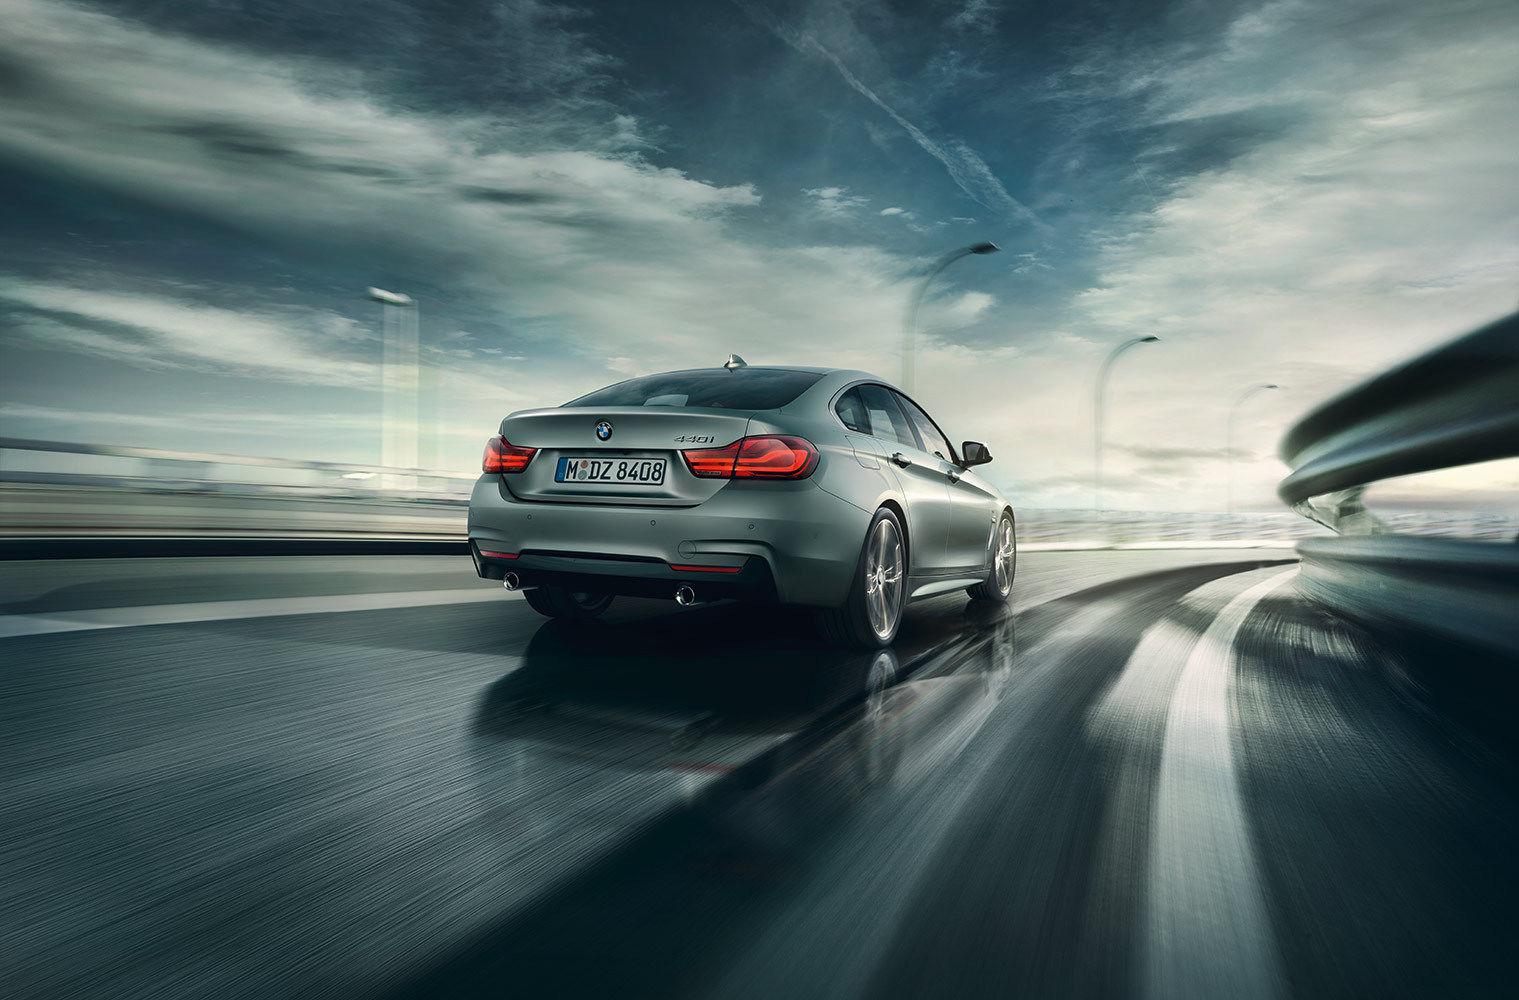 BMW 4series campaign / FRITHJOF OHM & PRETZSCH